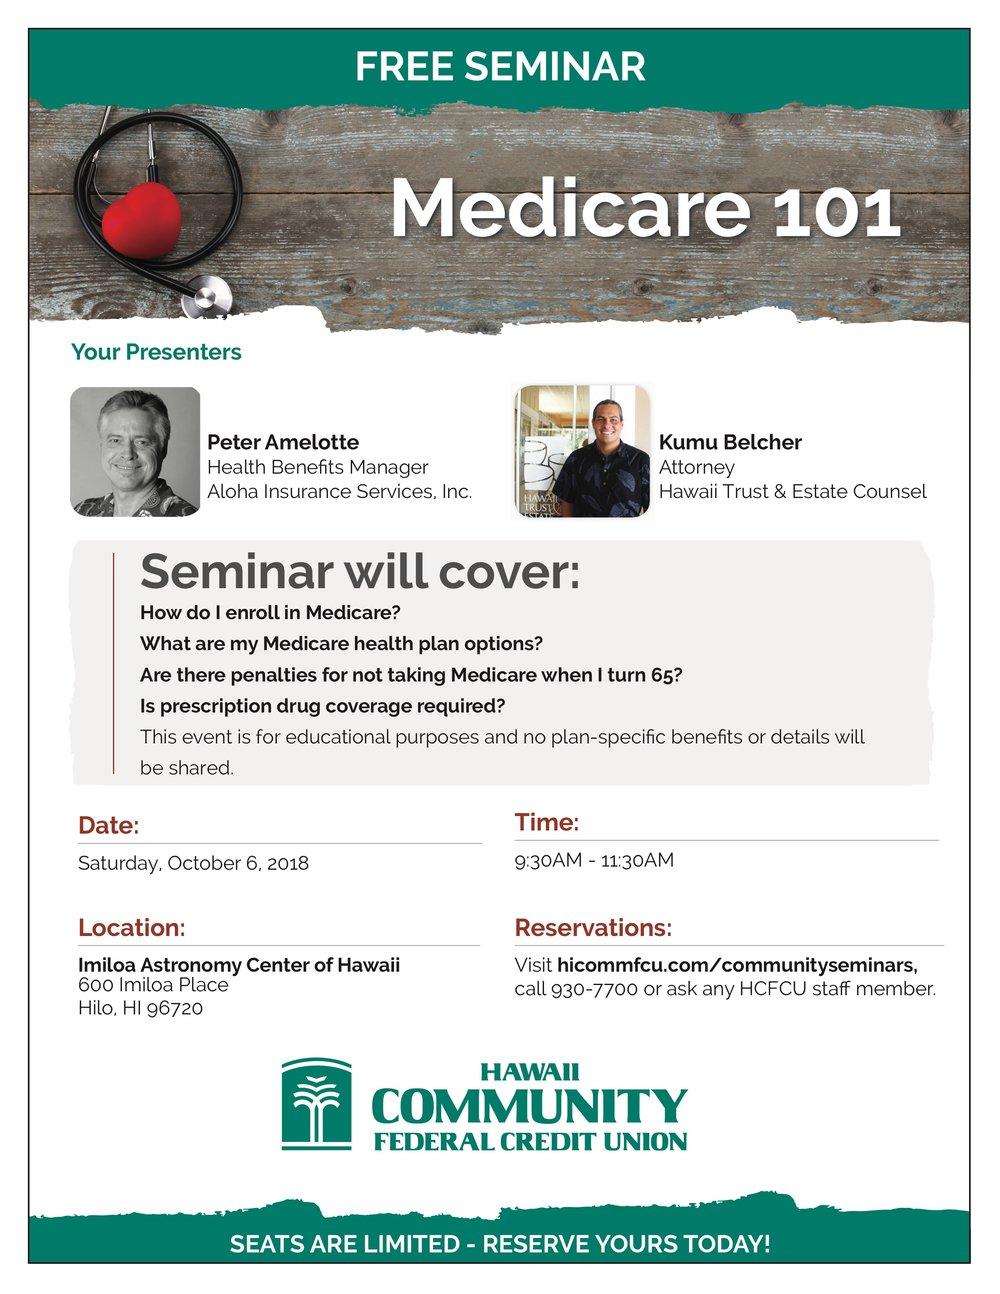 HCFCU_100618_Medicare_Hilo.jpg